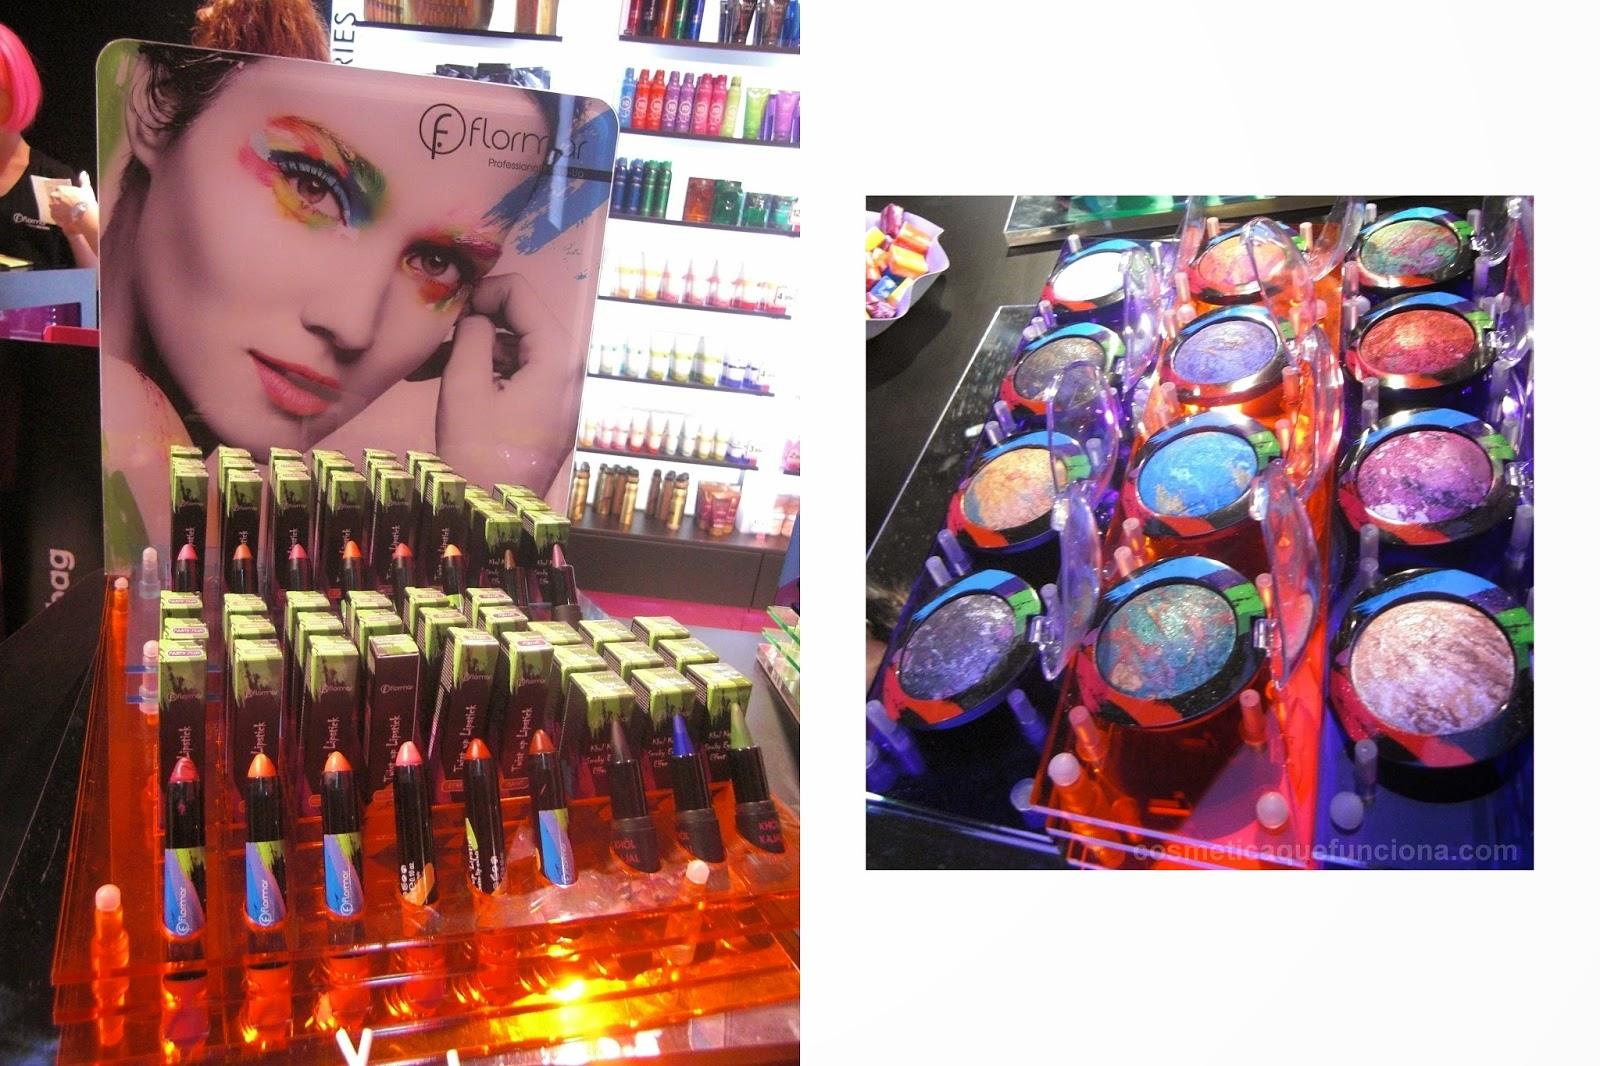 Intenz Diagonal, una experiencia única dentro de la Barcelona Shopping Night - Blog de Belleza Cosmetica que Si Funciona